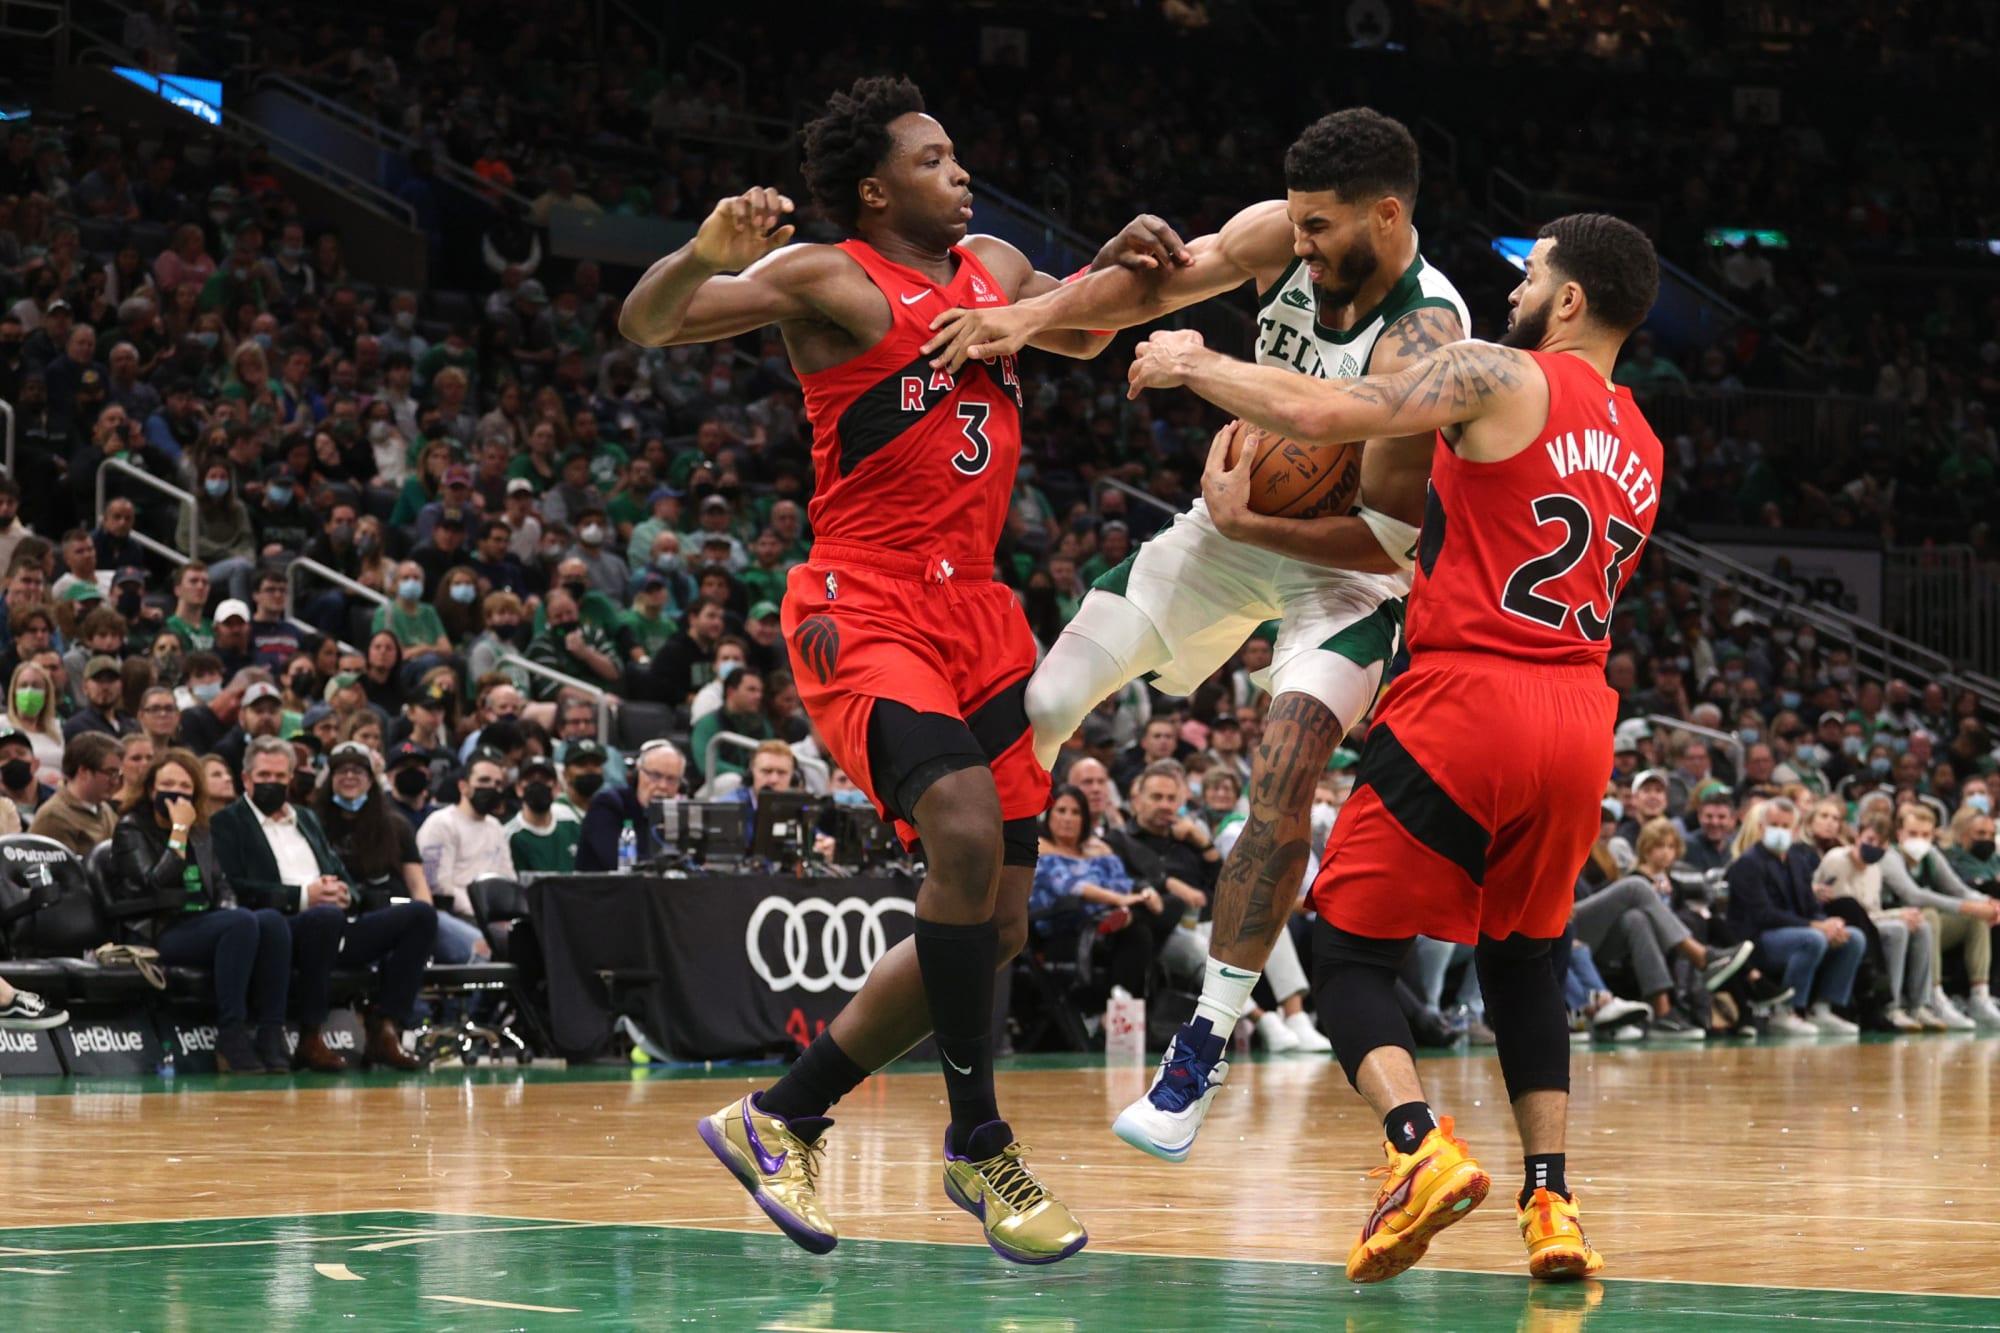 Raptors Game Tonight: Raptors vs Mavericks Odds, Starting Lineup, Injury Report, Predictions, TV Channel for Oct. 23